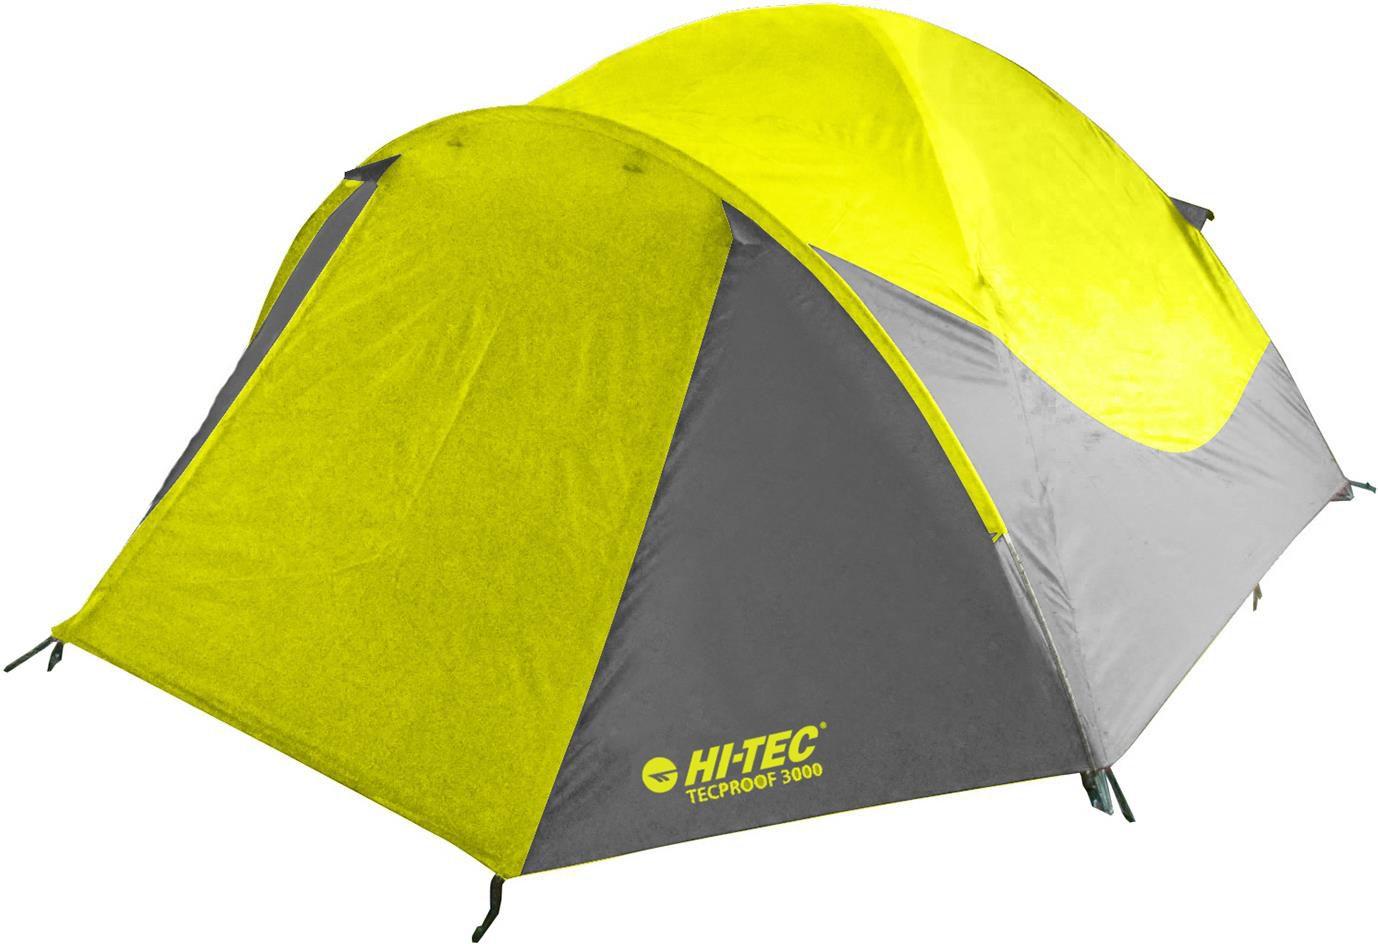 Hi-tec TOBAGO 3 - 5901979023050 telts Kempingiem, pārgājieniem